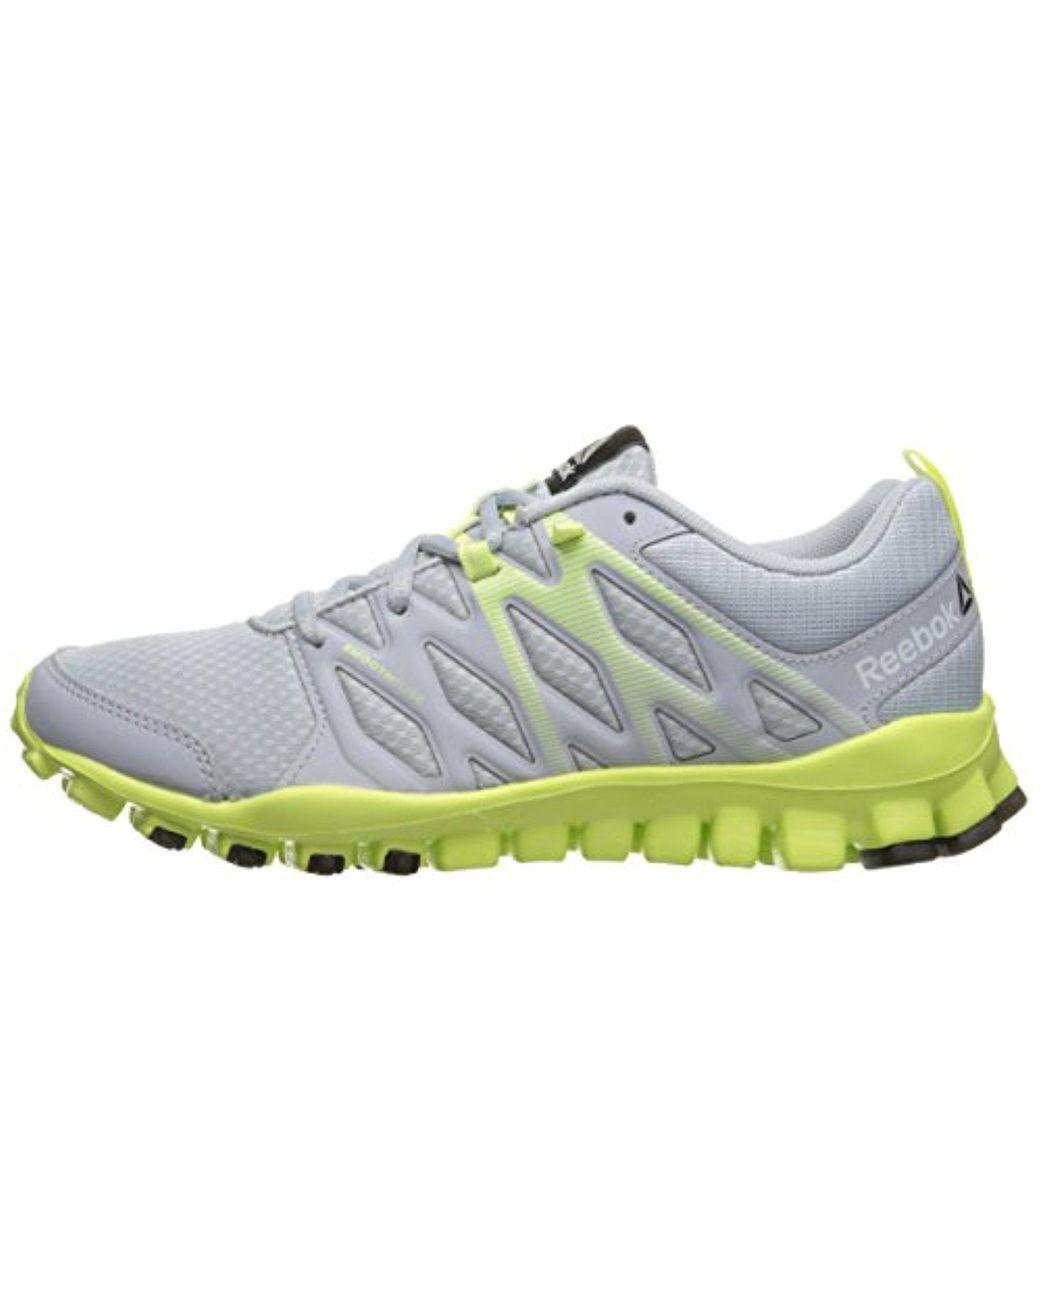 79158e8492 Women's Gray Realflex Train 4.0 Cross-trainer Shoe